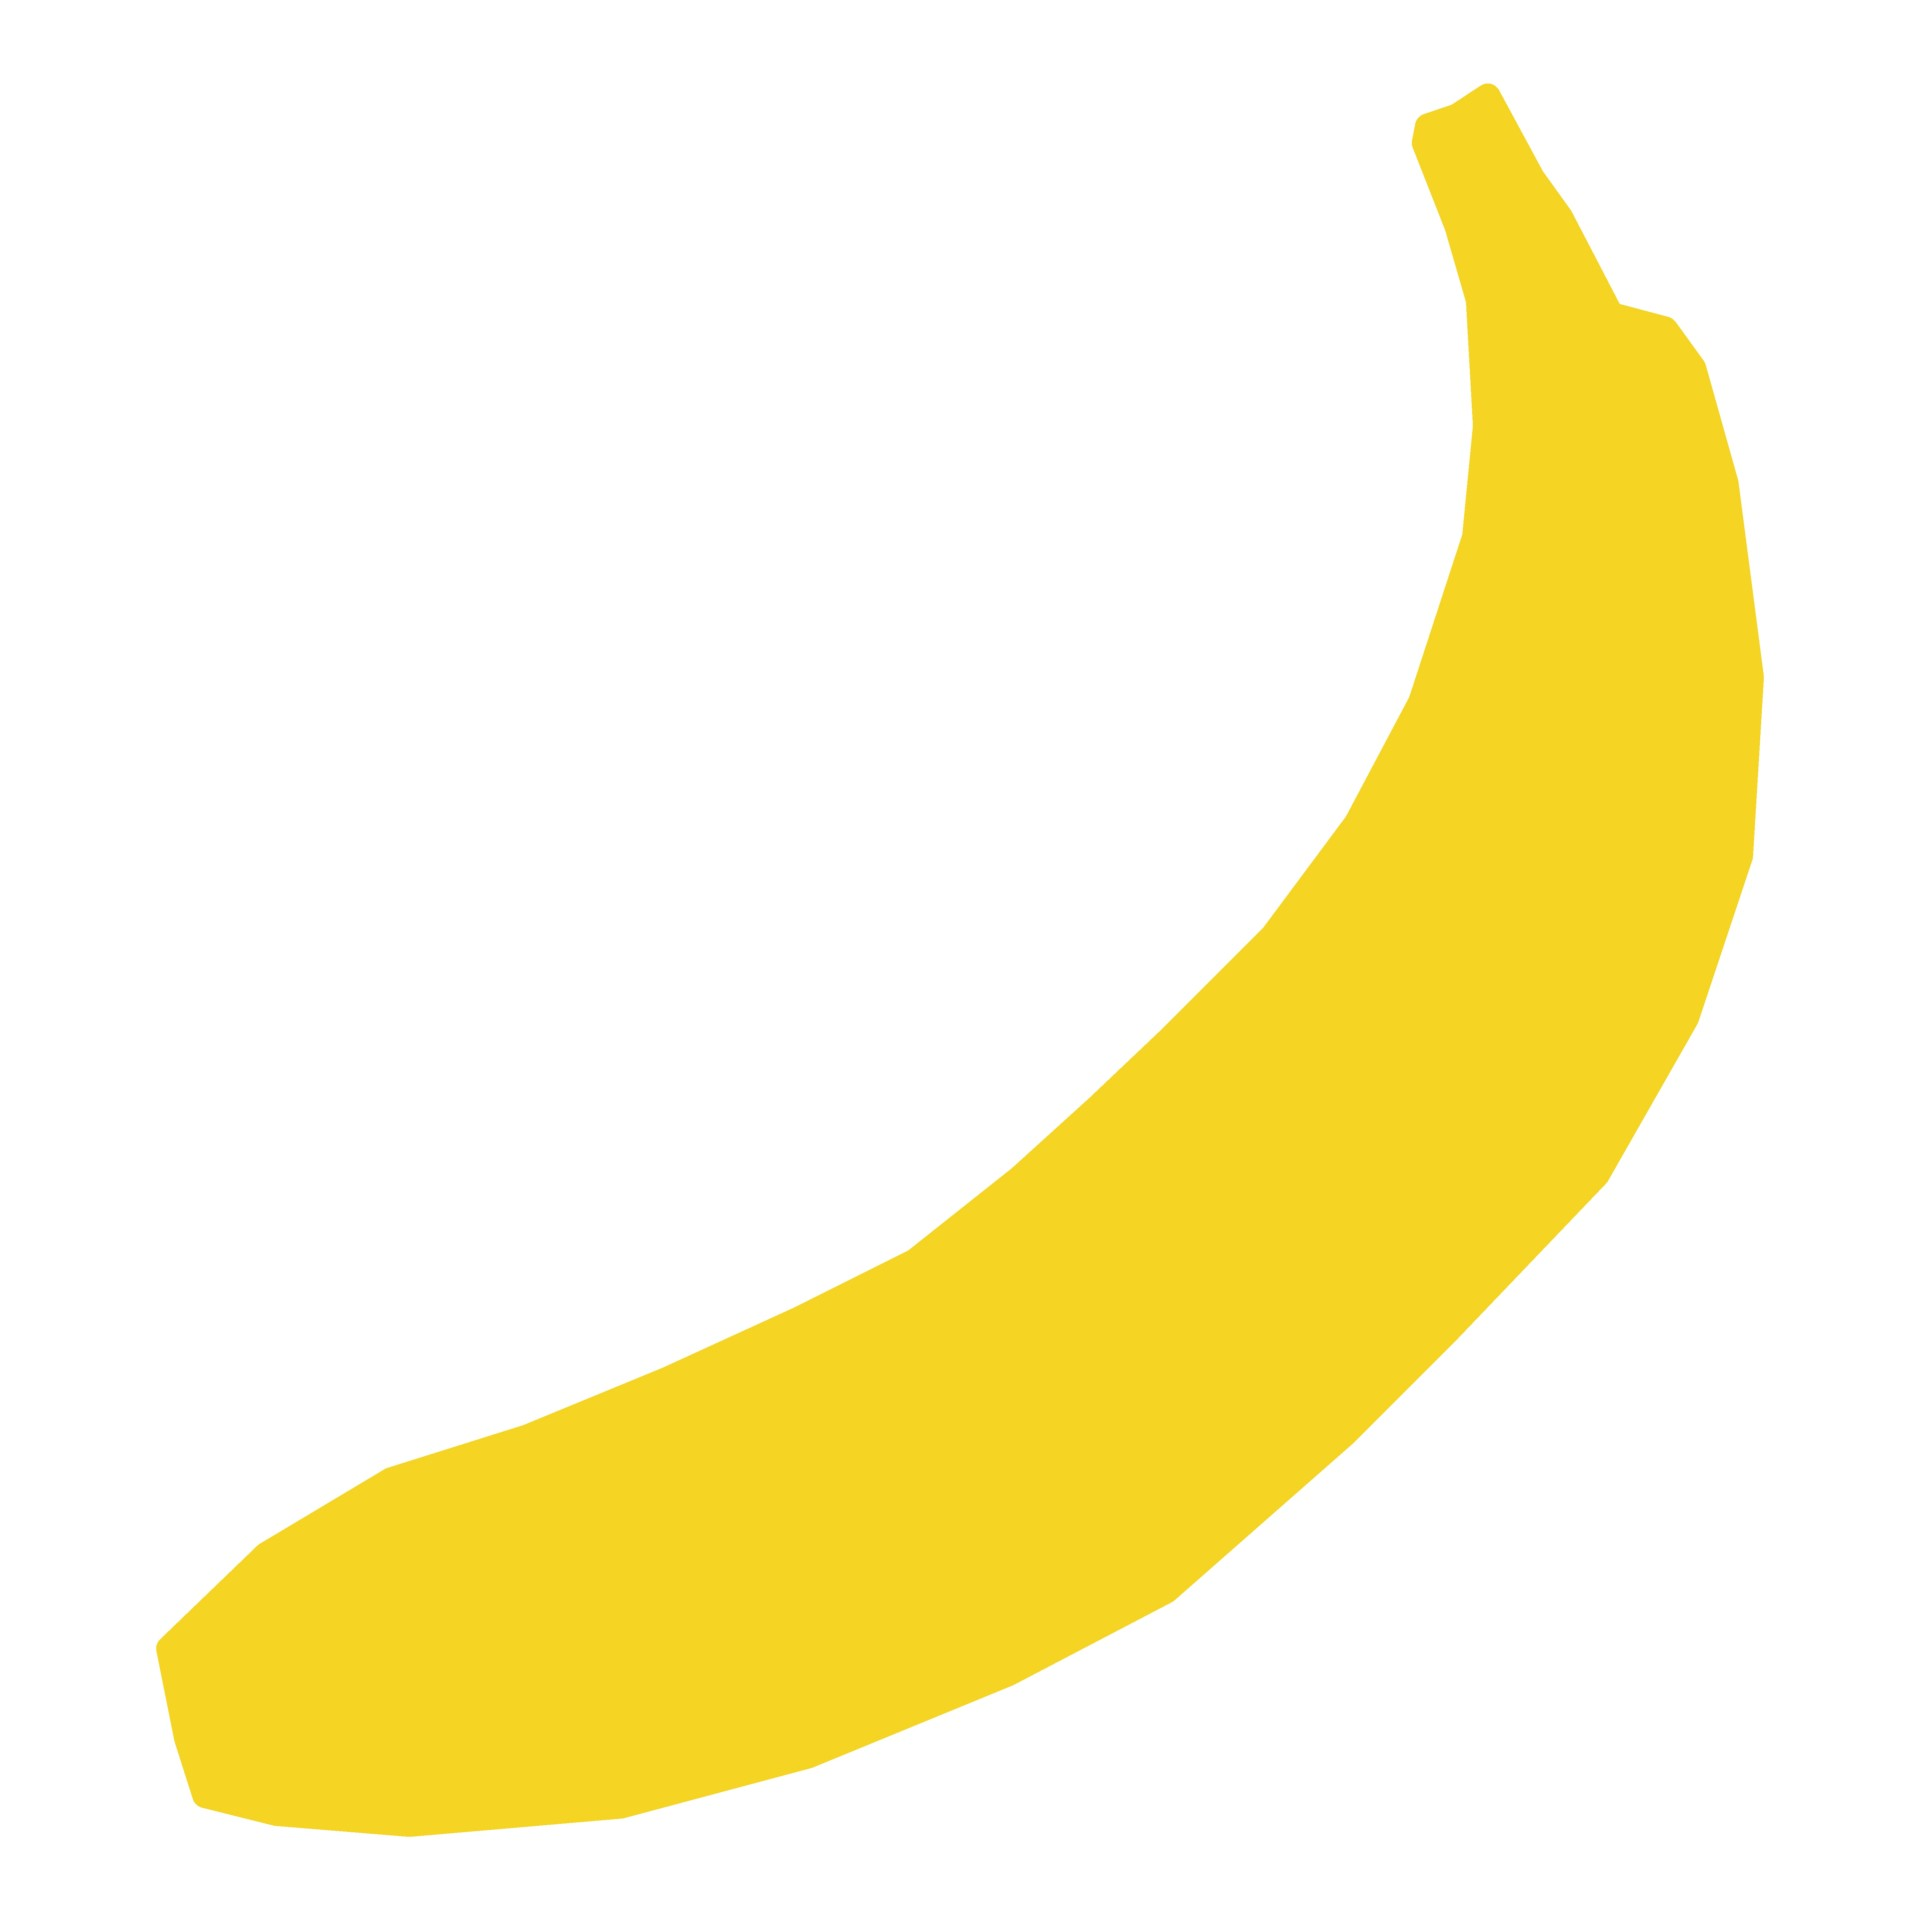 1920x1920 Banana Silhouette Free Stock Photo